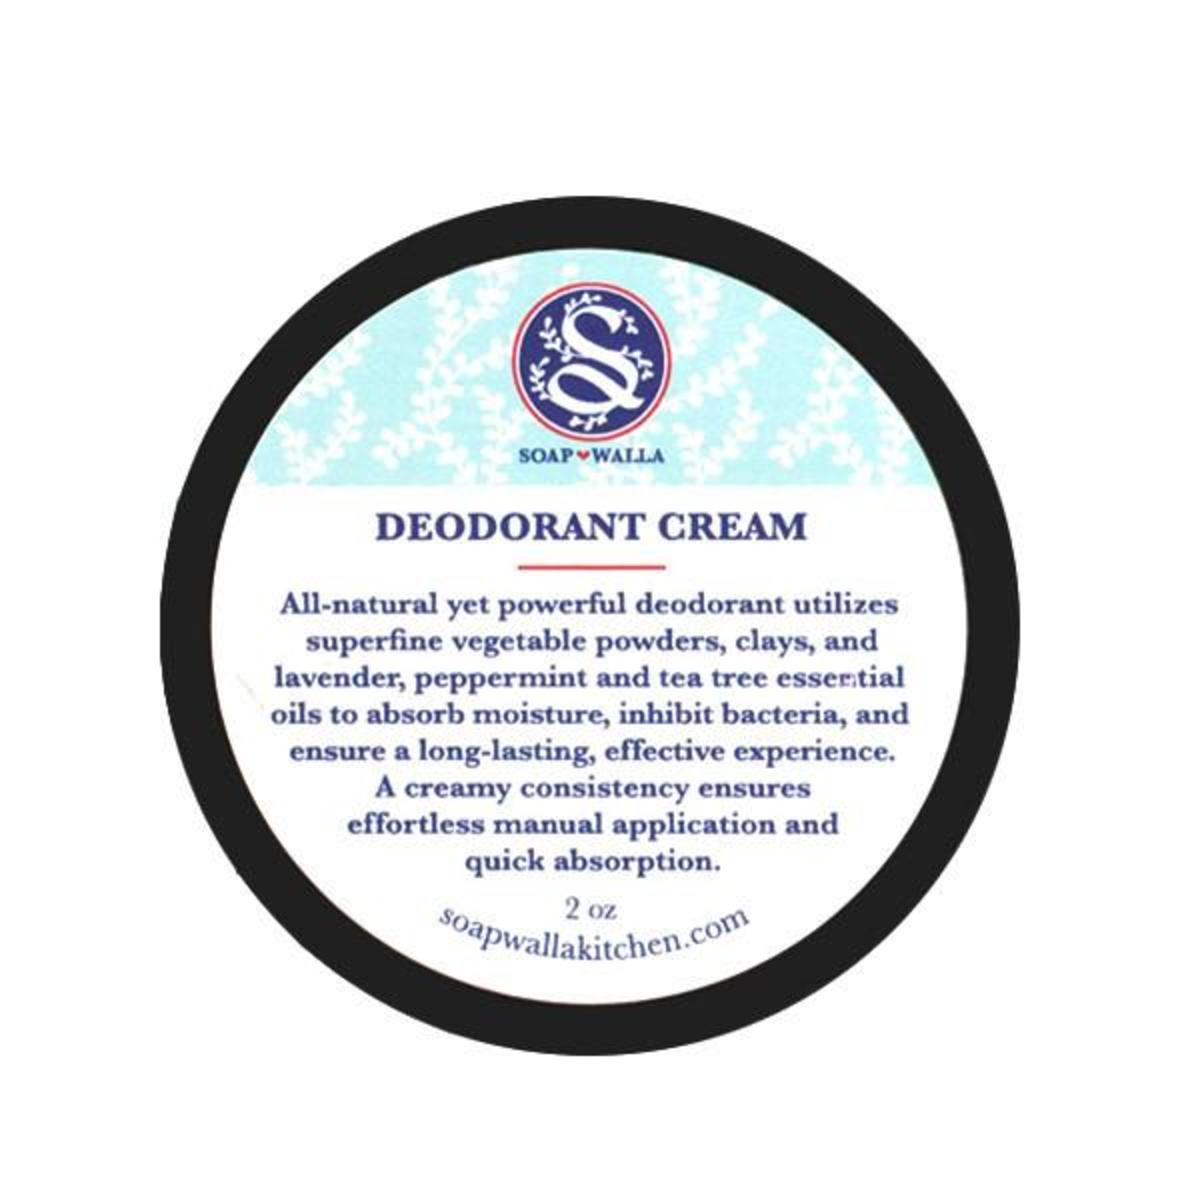 Soapwalla Original Deodorant Cream